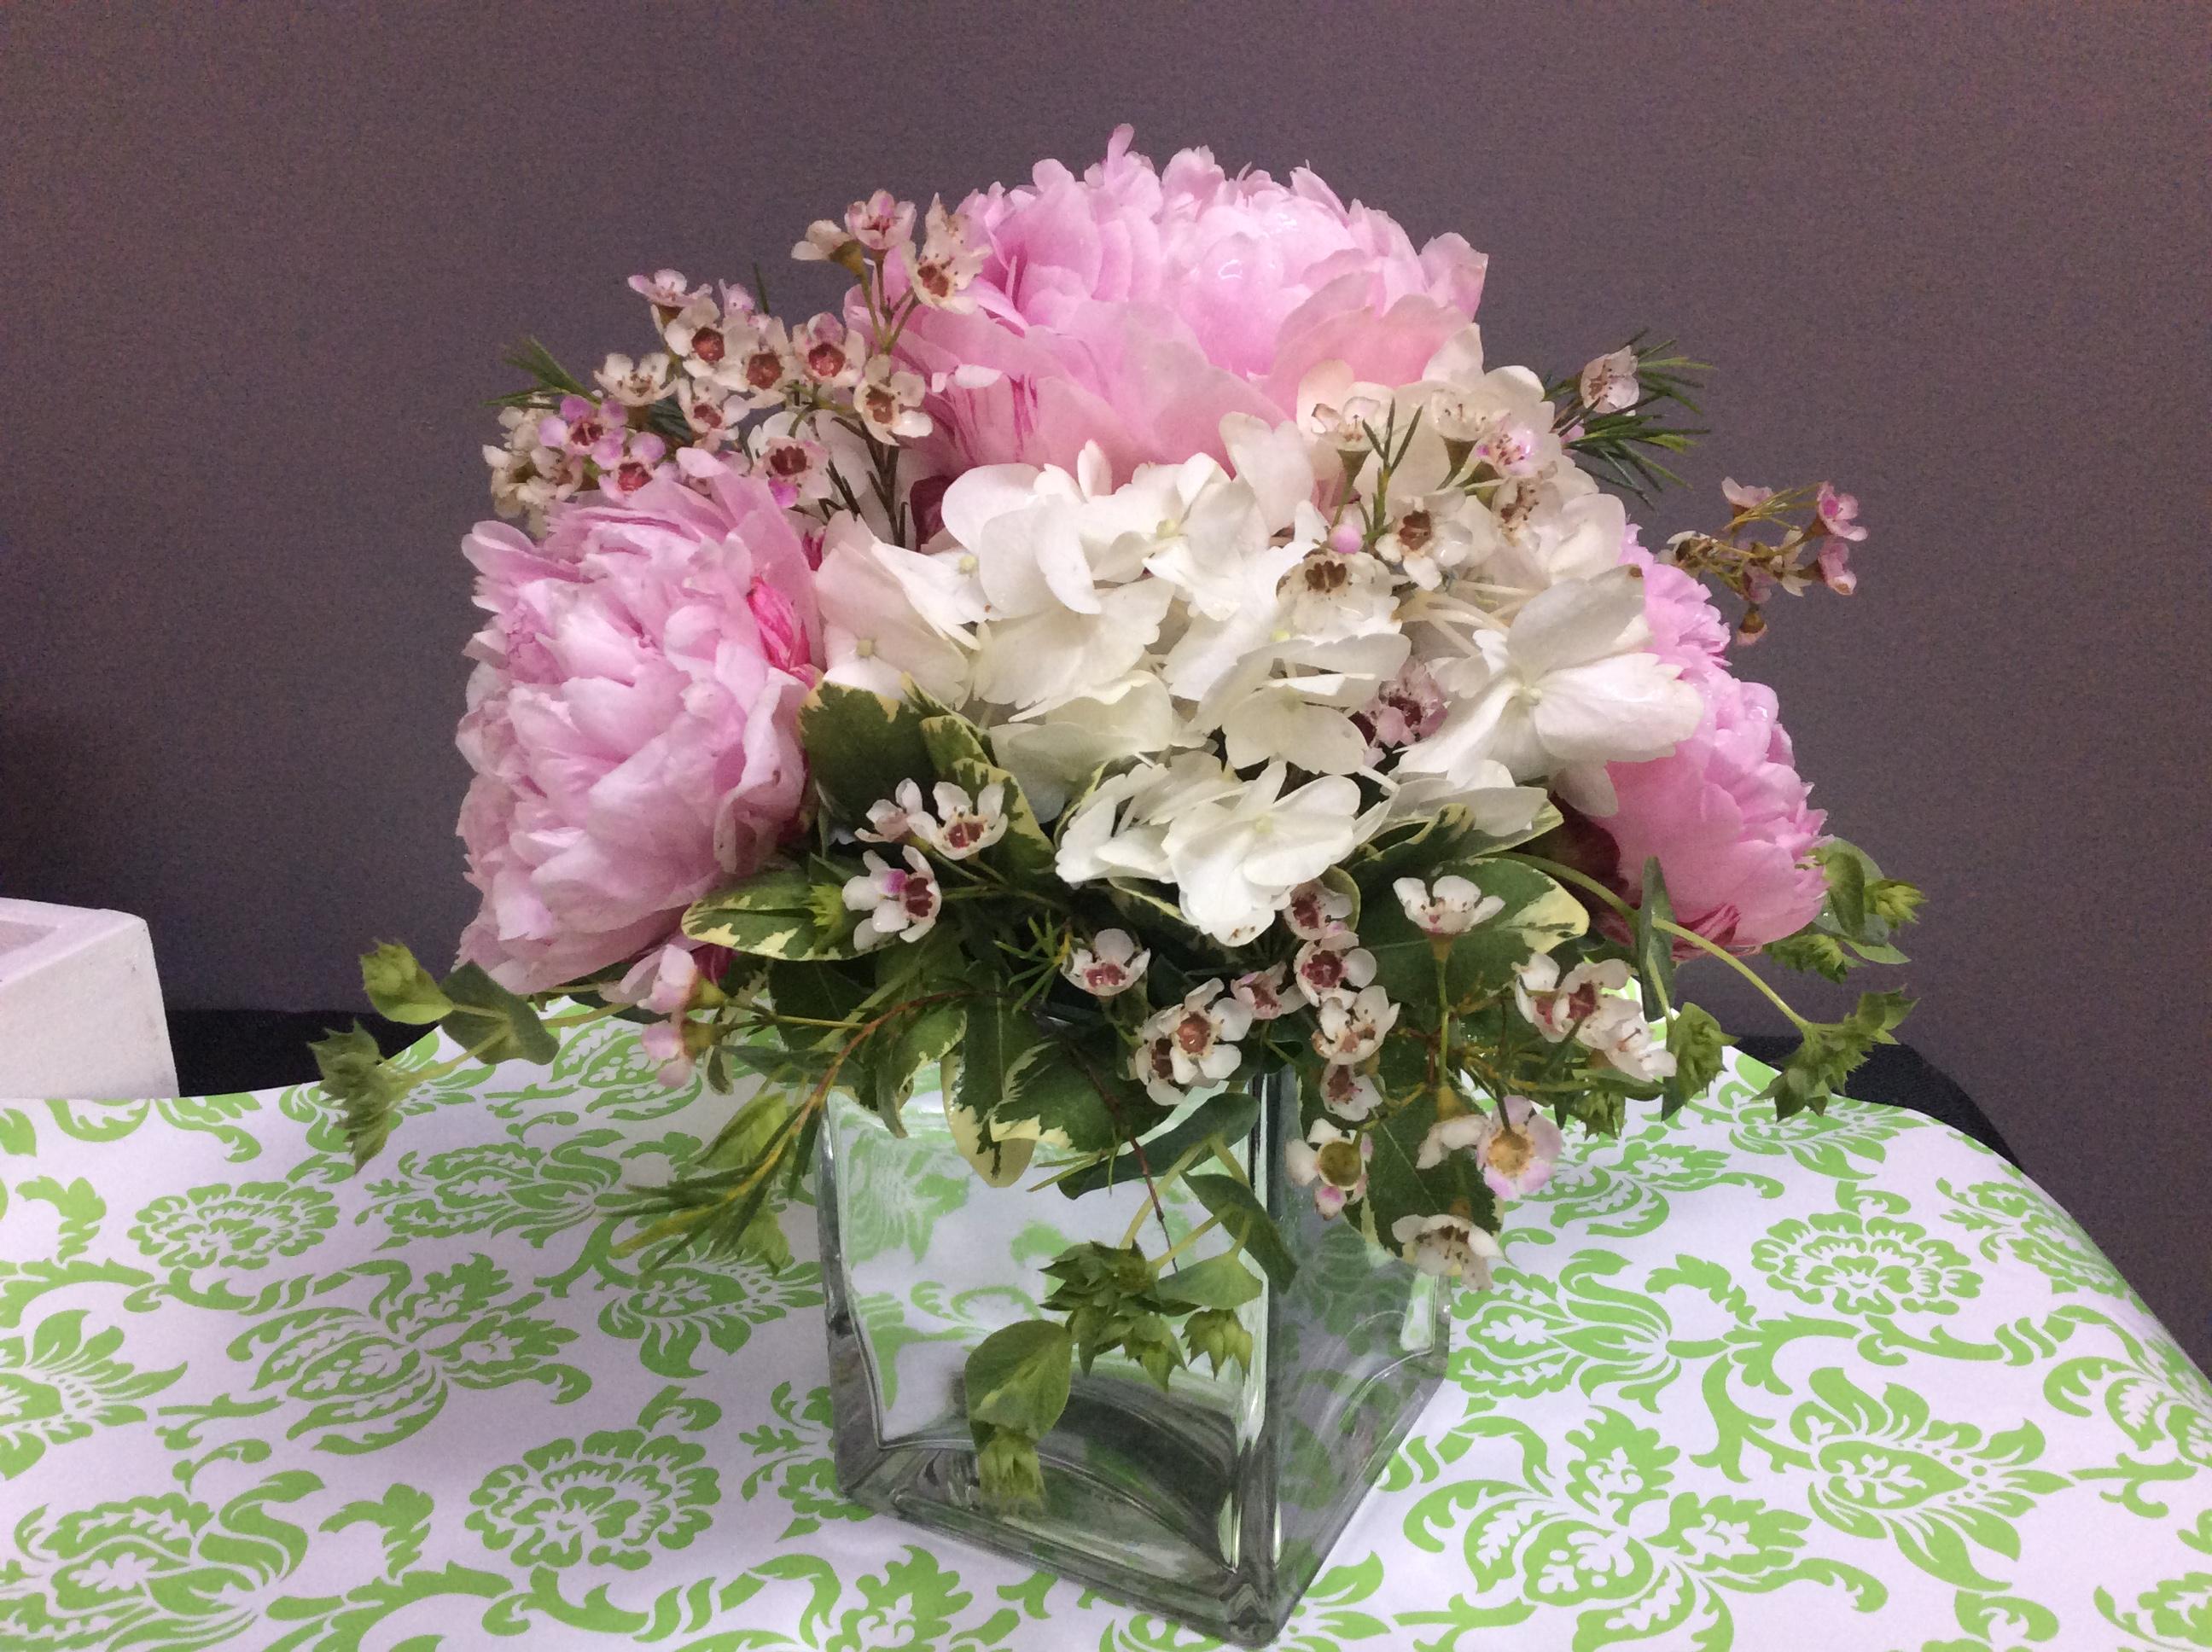 Pat's Florist And Gourmet Baskets Inc image 4